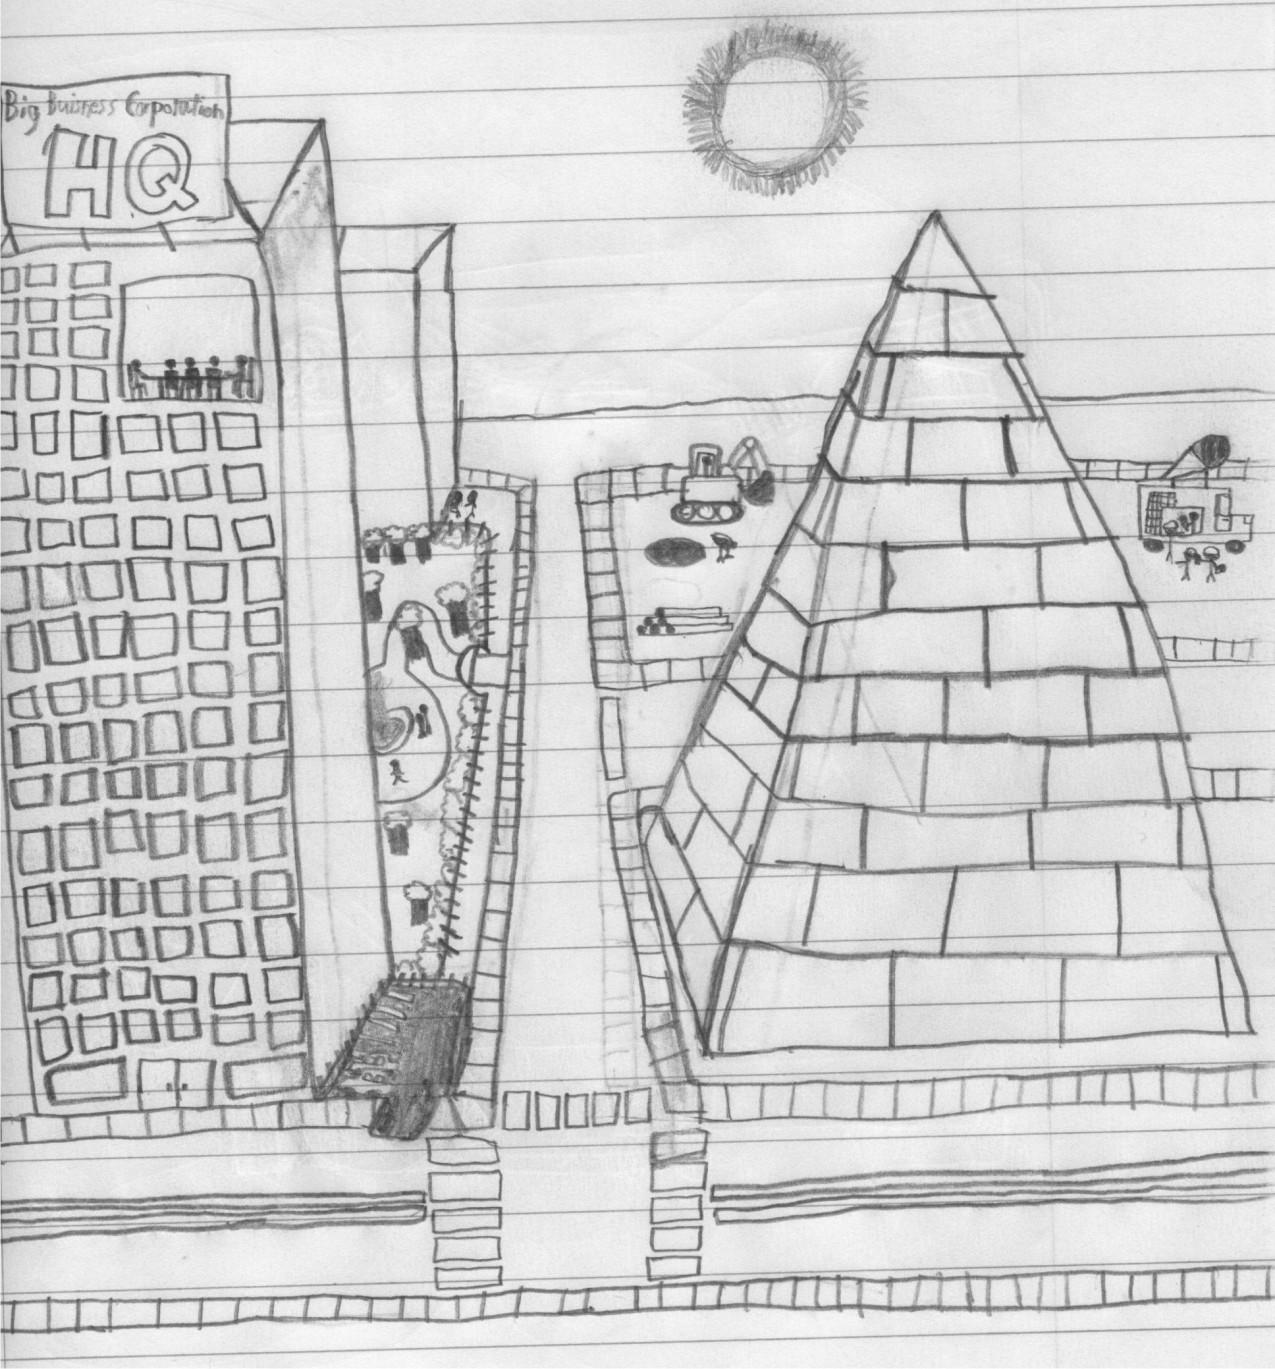 The Urban Pyramid